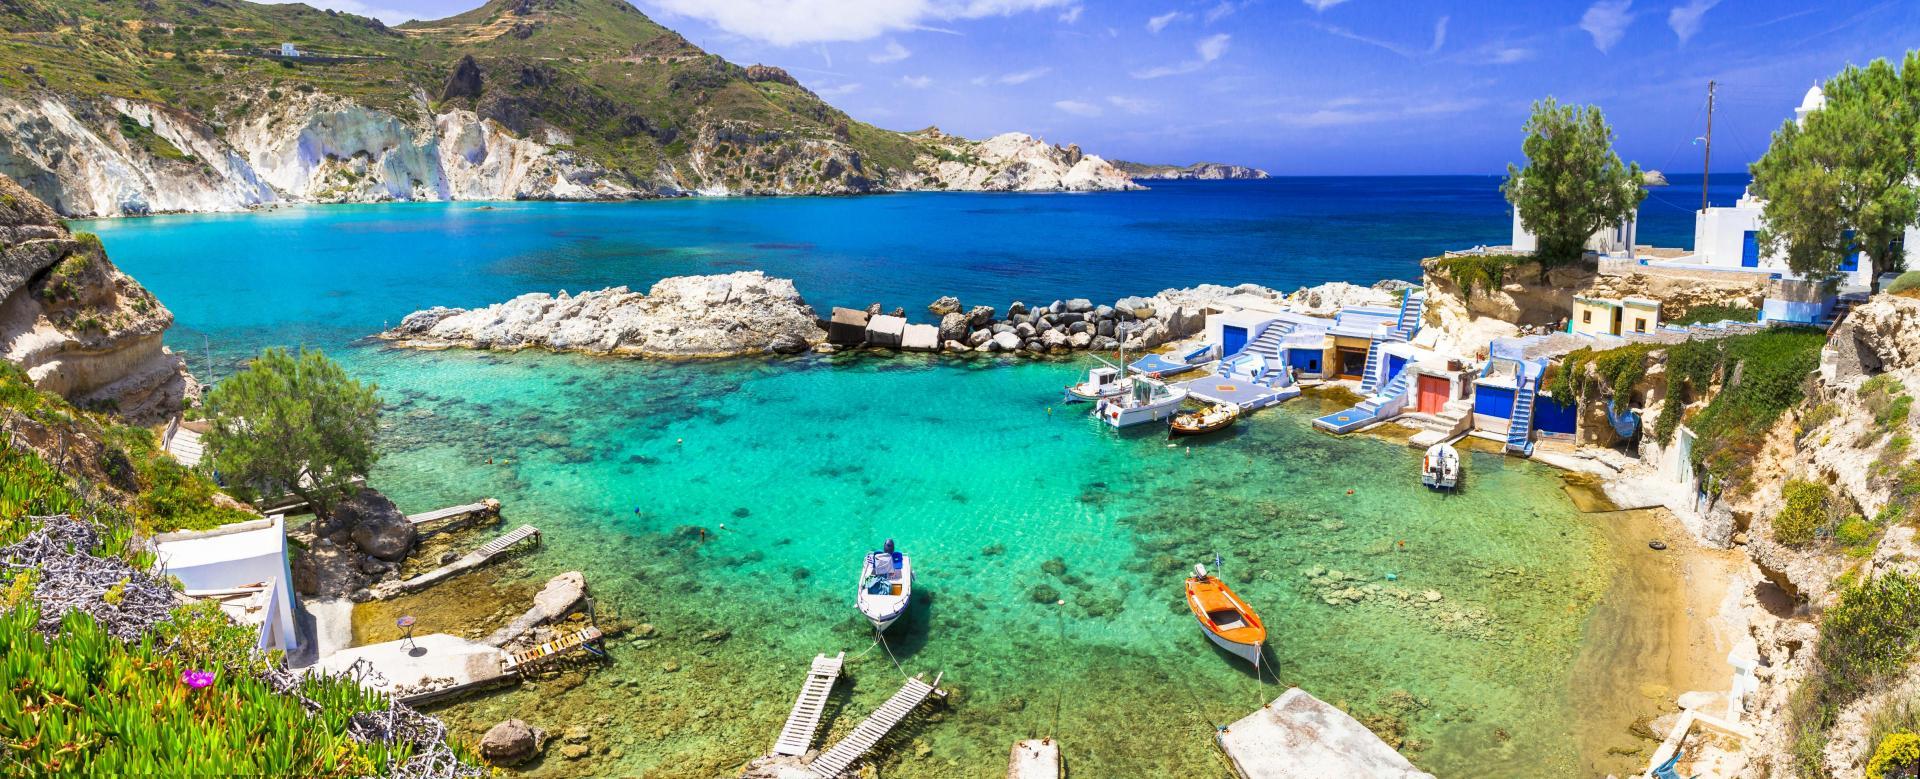 Voyage à pied : Idylliques cyclades : sifnos, kimolos et milos